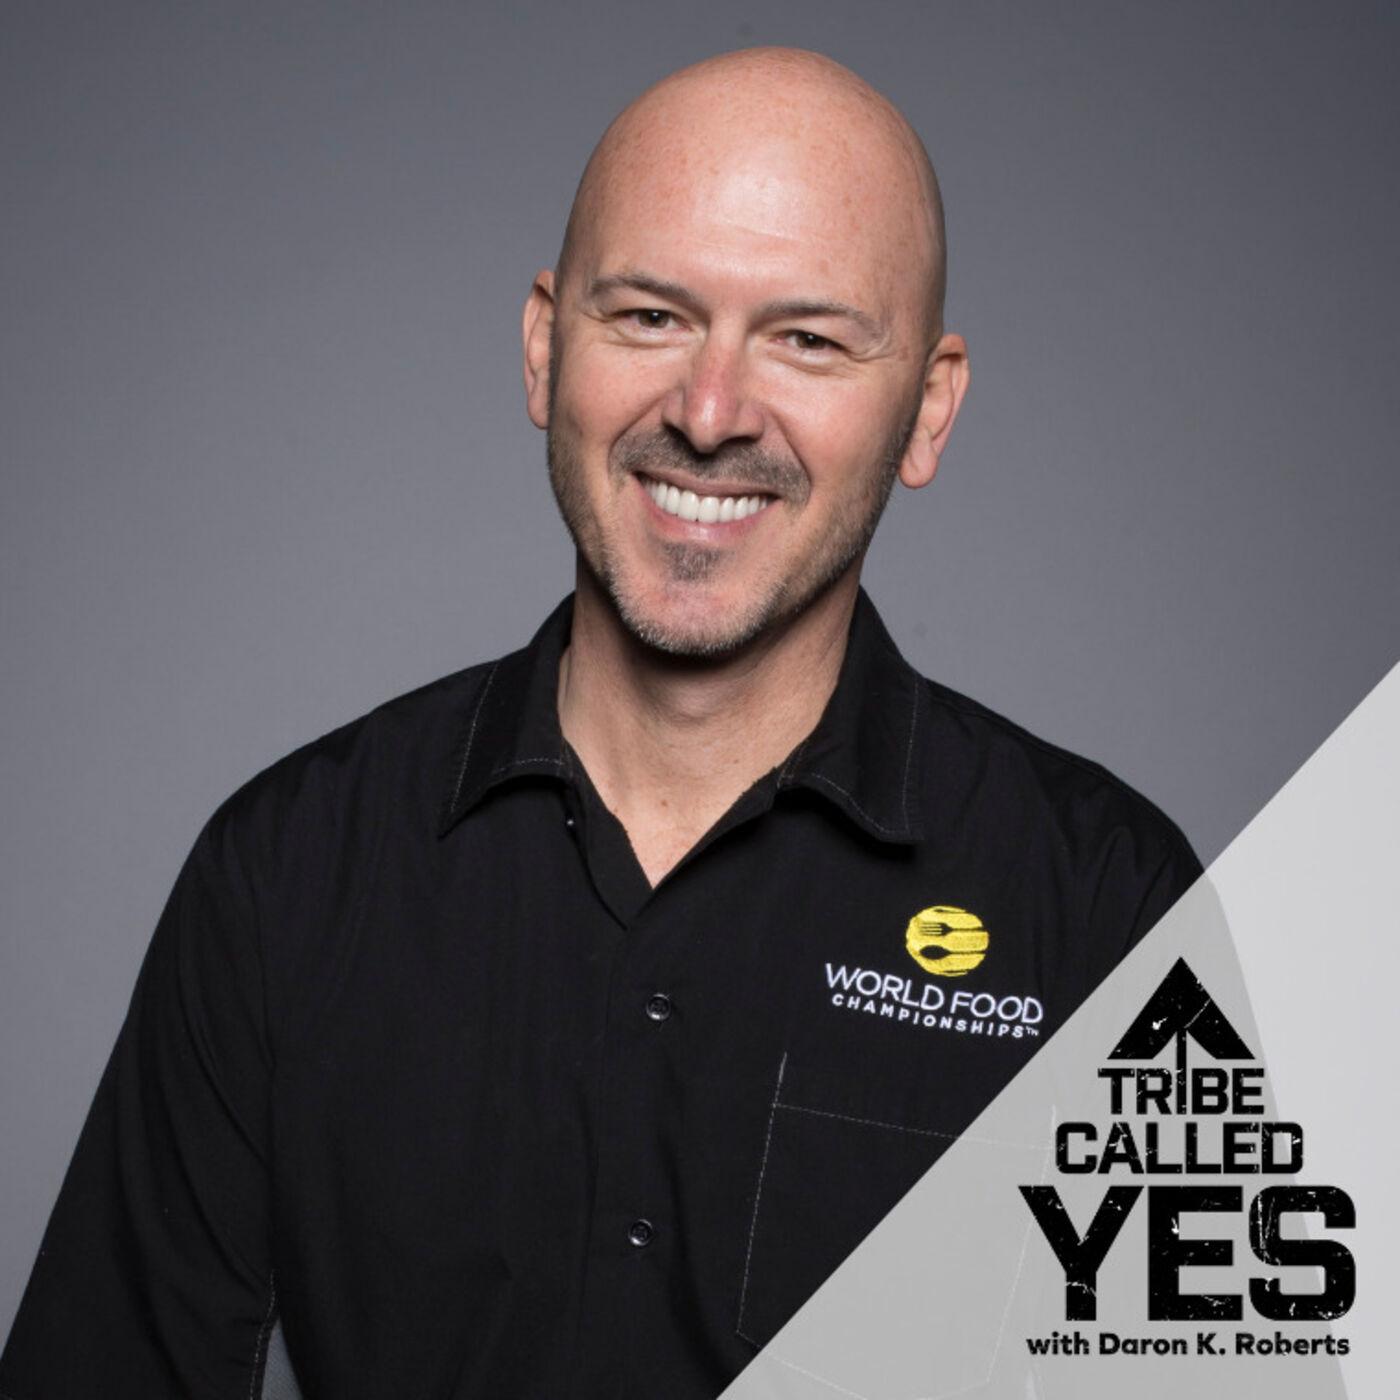 Ep. 105 - The Salesman: Mike McCloud